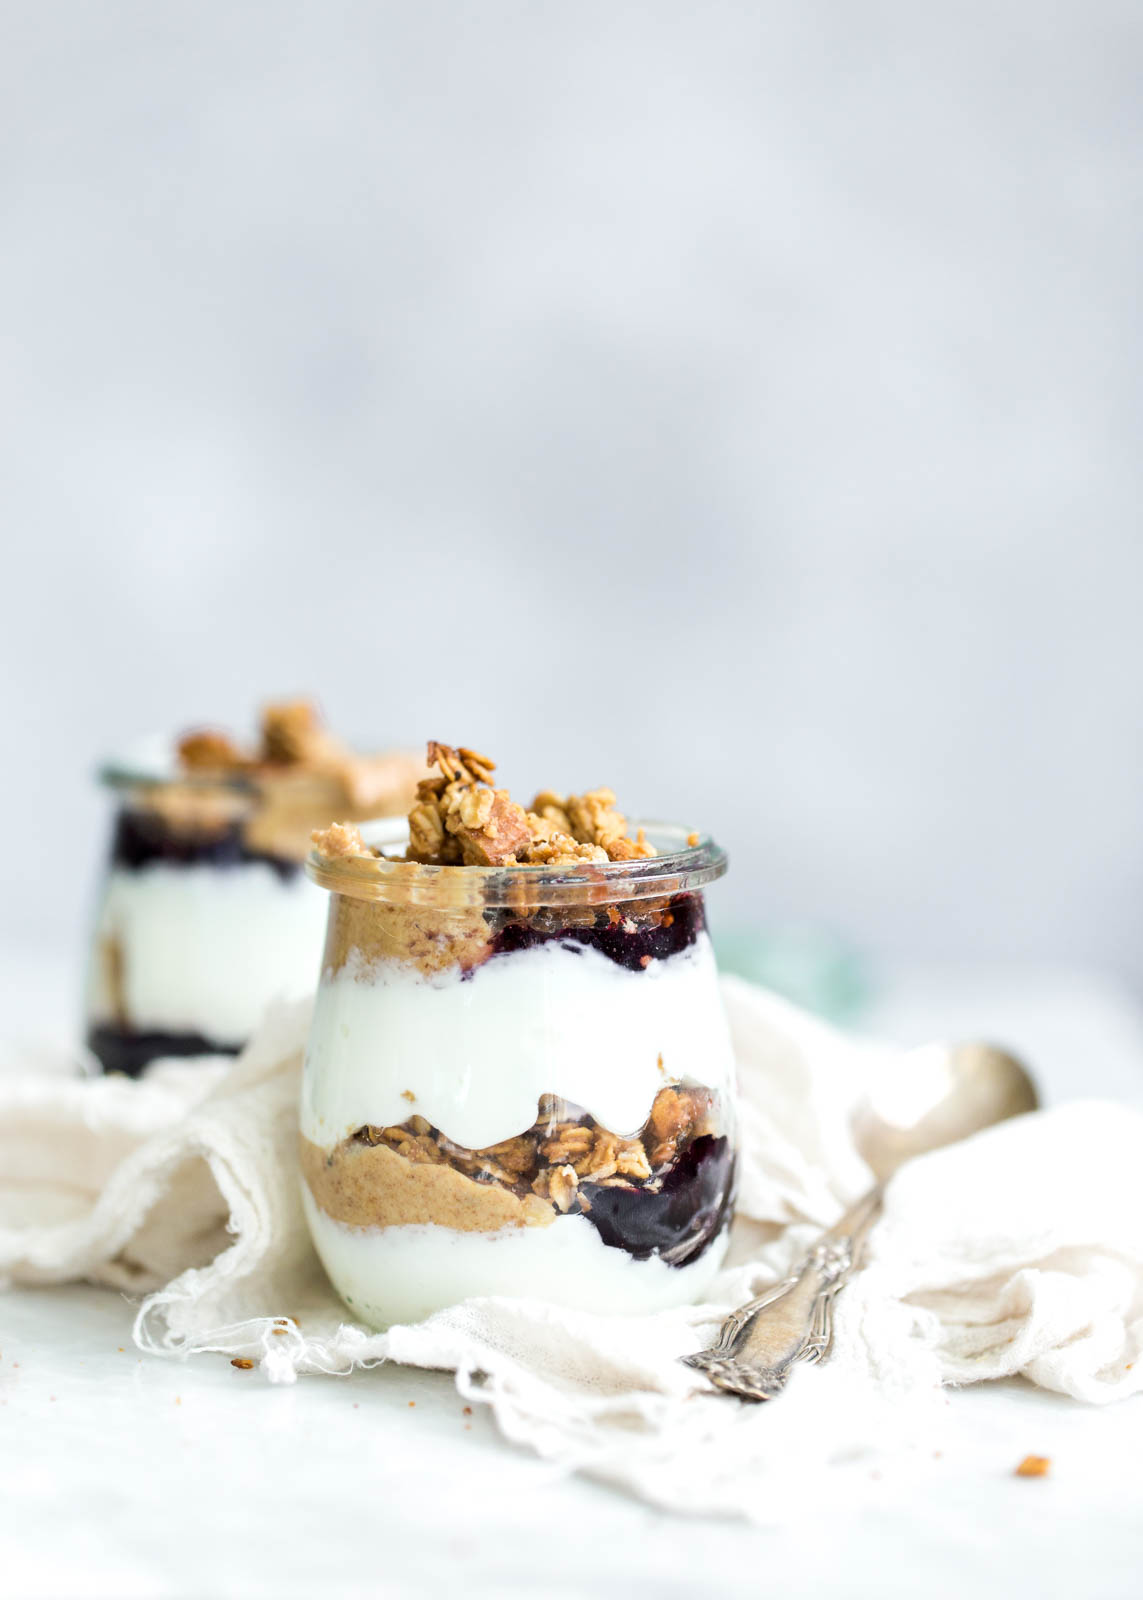 Peanut Butter and Jelly Yogurt Parfaits made with homemade peanut butter and honey granola and protein-packed Greek yogurt. YUM!